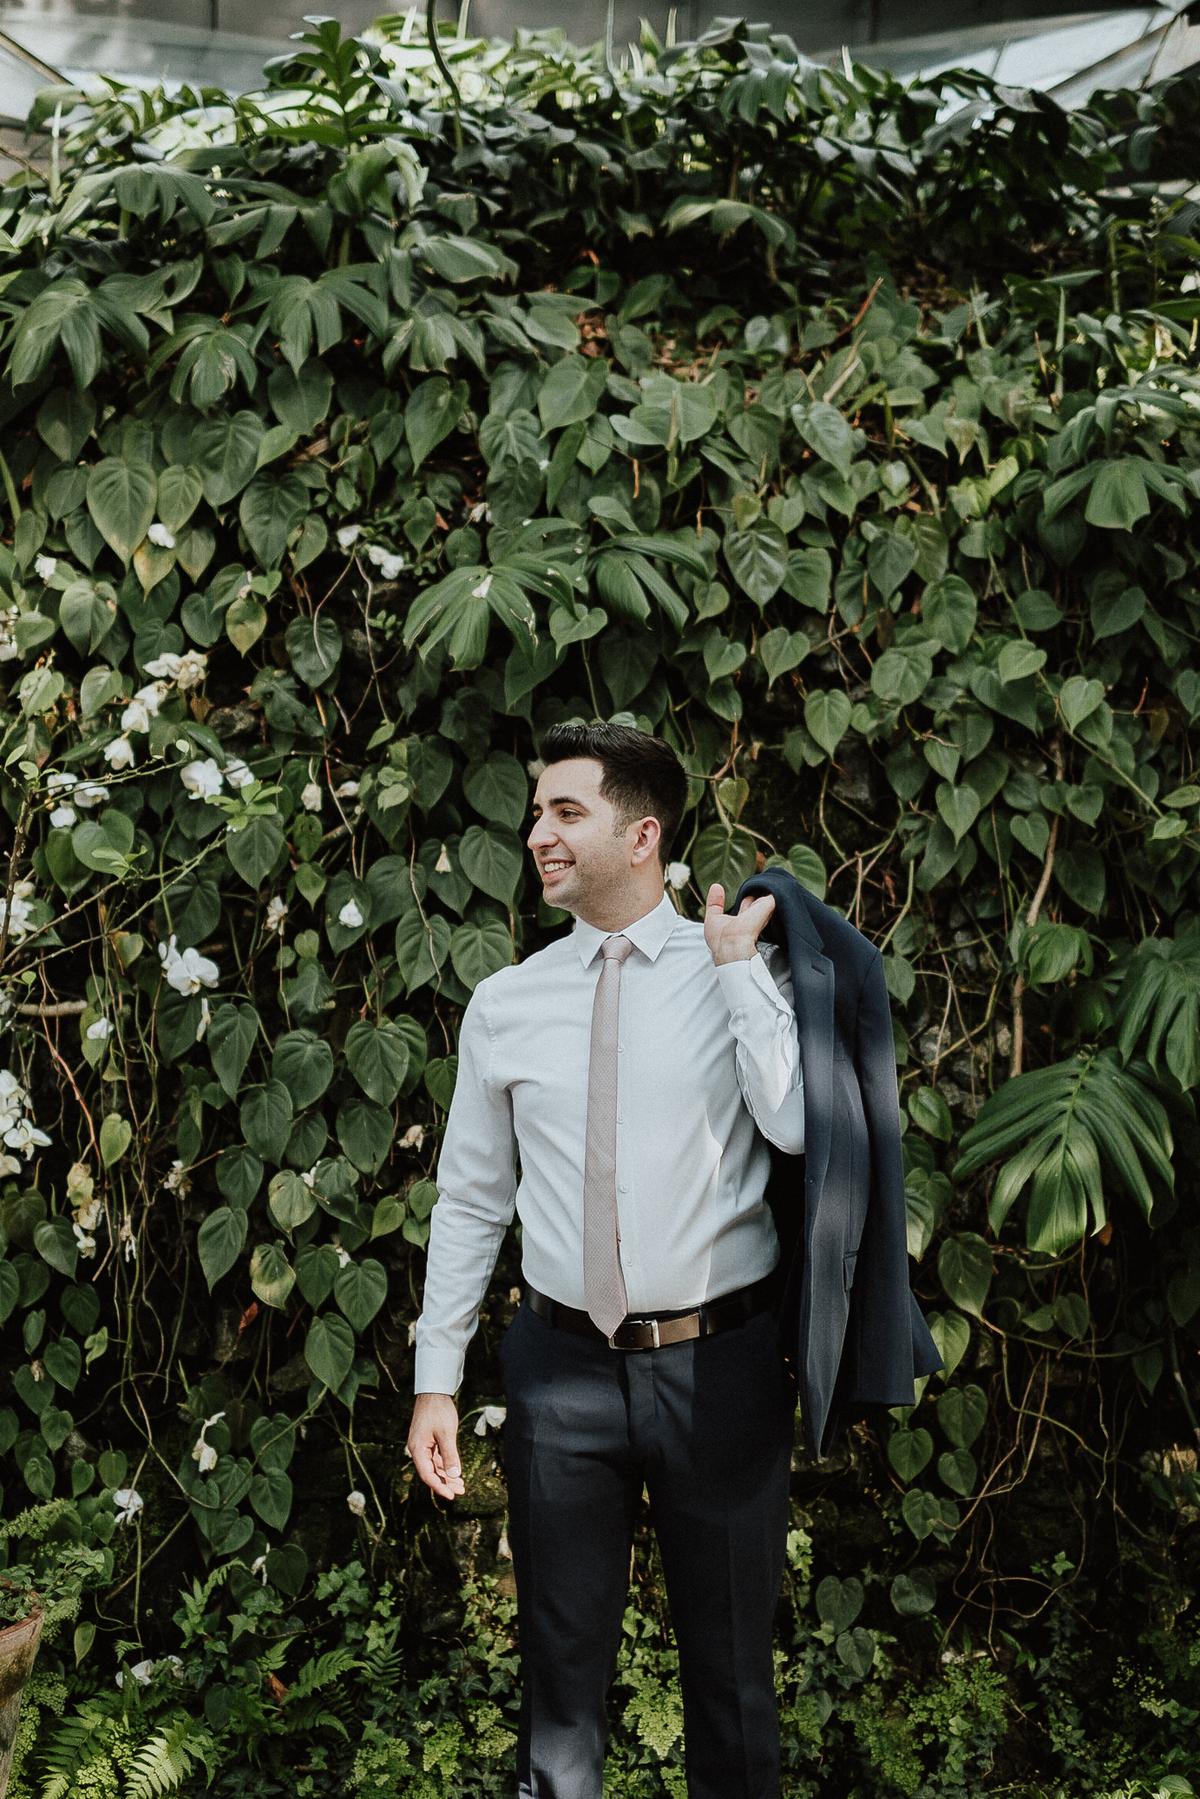 making of do noivo fotografos de casamento noivo com o pai dia do noivo casamentos de dia ao ar livre fotos reacao do noivo